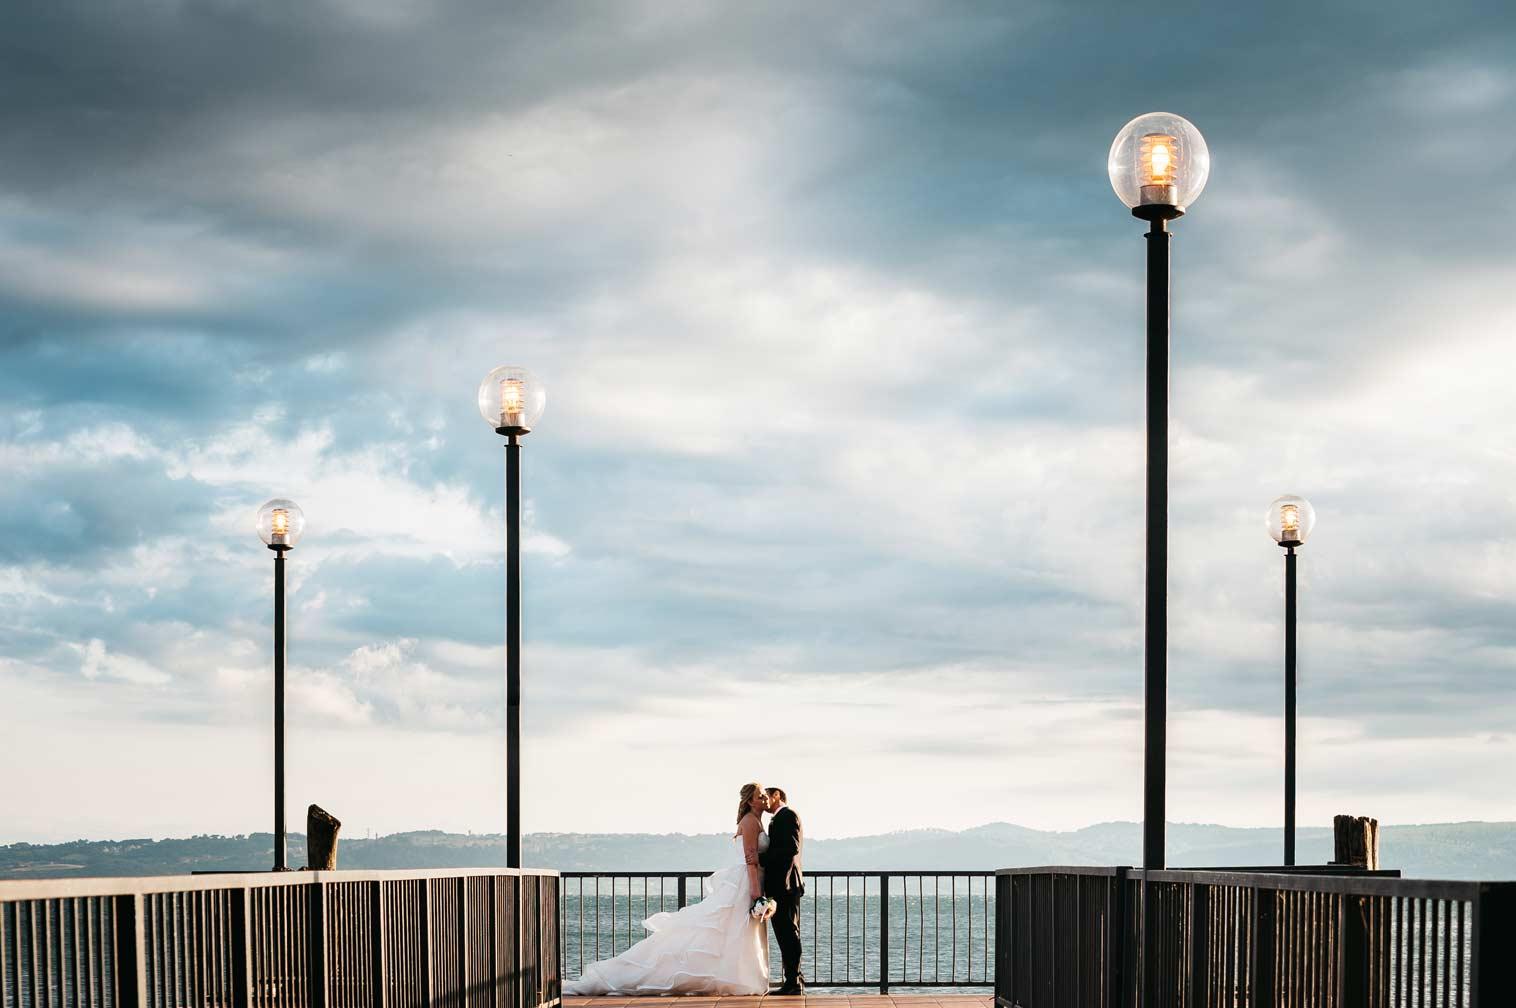 Reportage-Wedding-Photography-Portraits